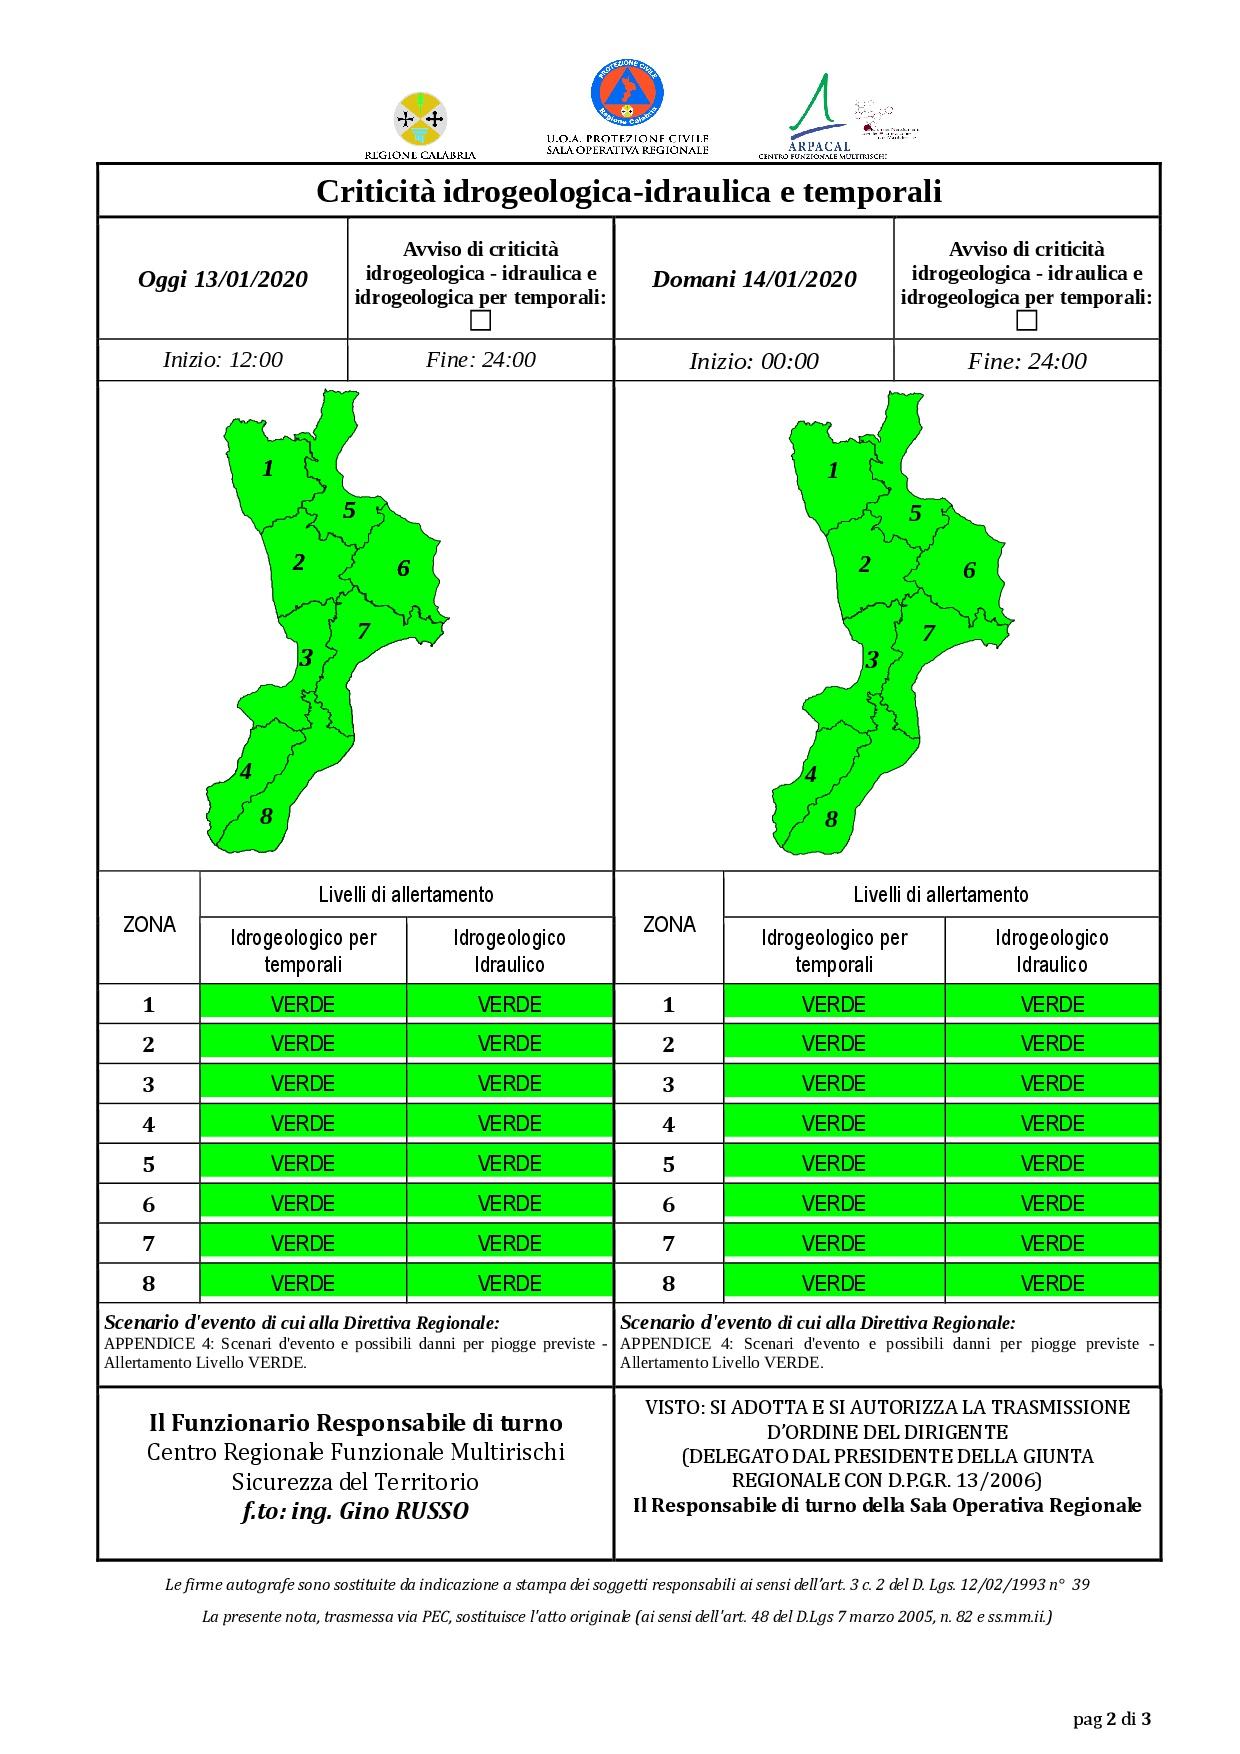 Criticità idrogeologica-idraulica e temporali in Calabria 13-01-2020